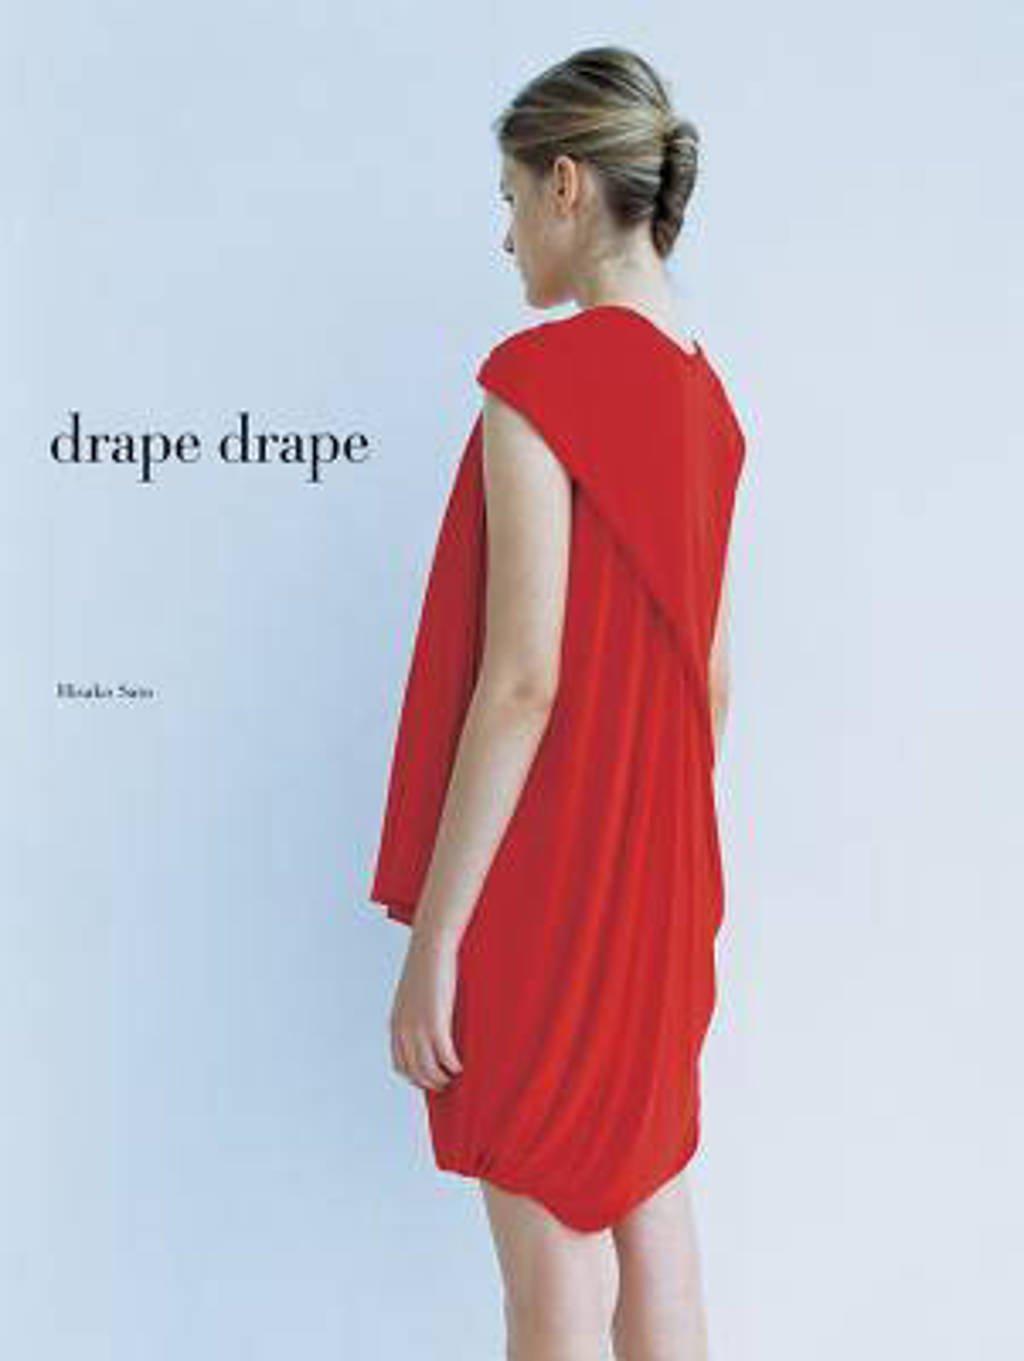 Drape Drape - Sato, Hisako